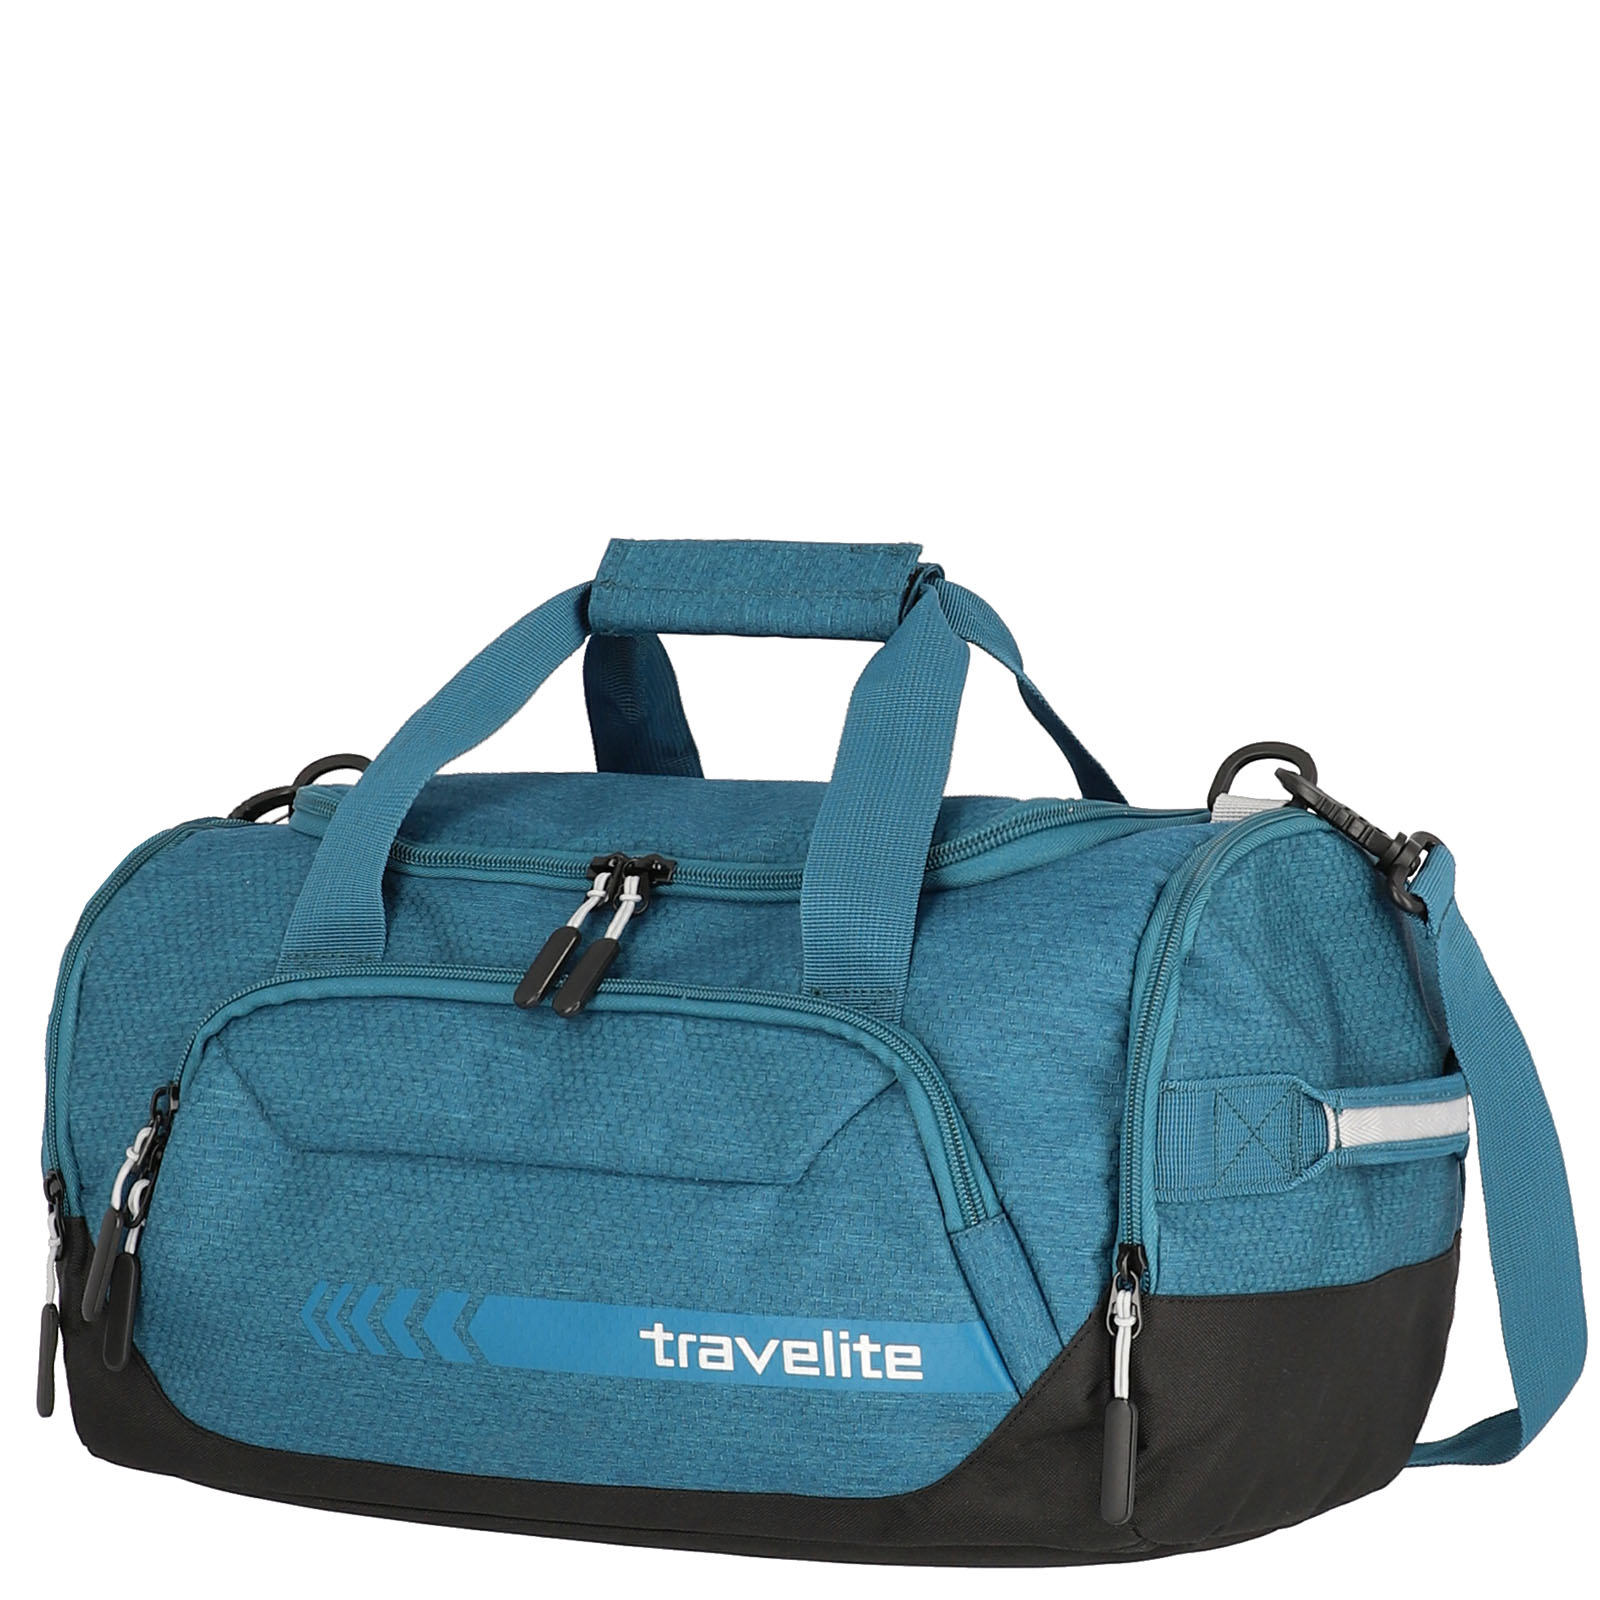 travelite-kick-off-reisetasche-s-petrol